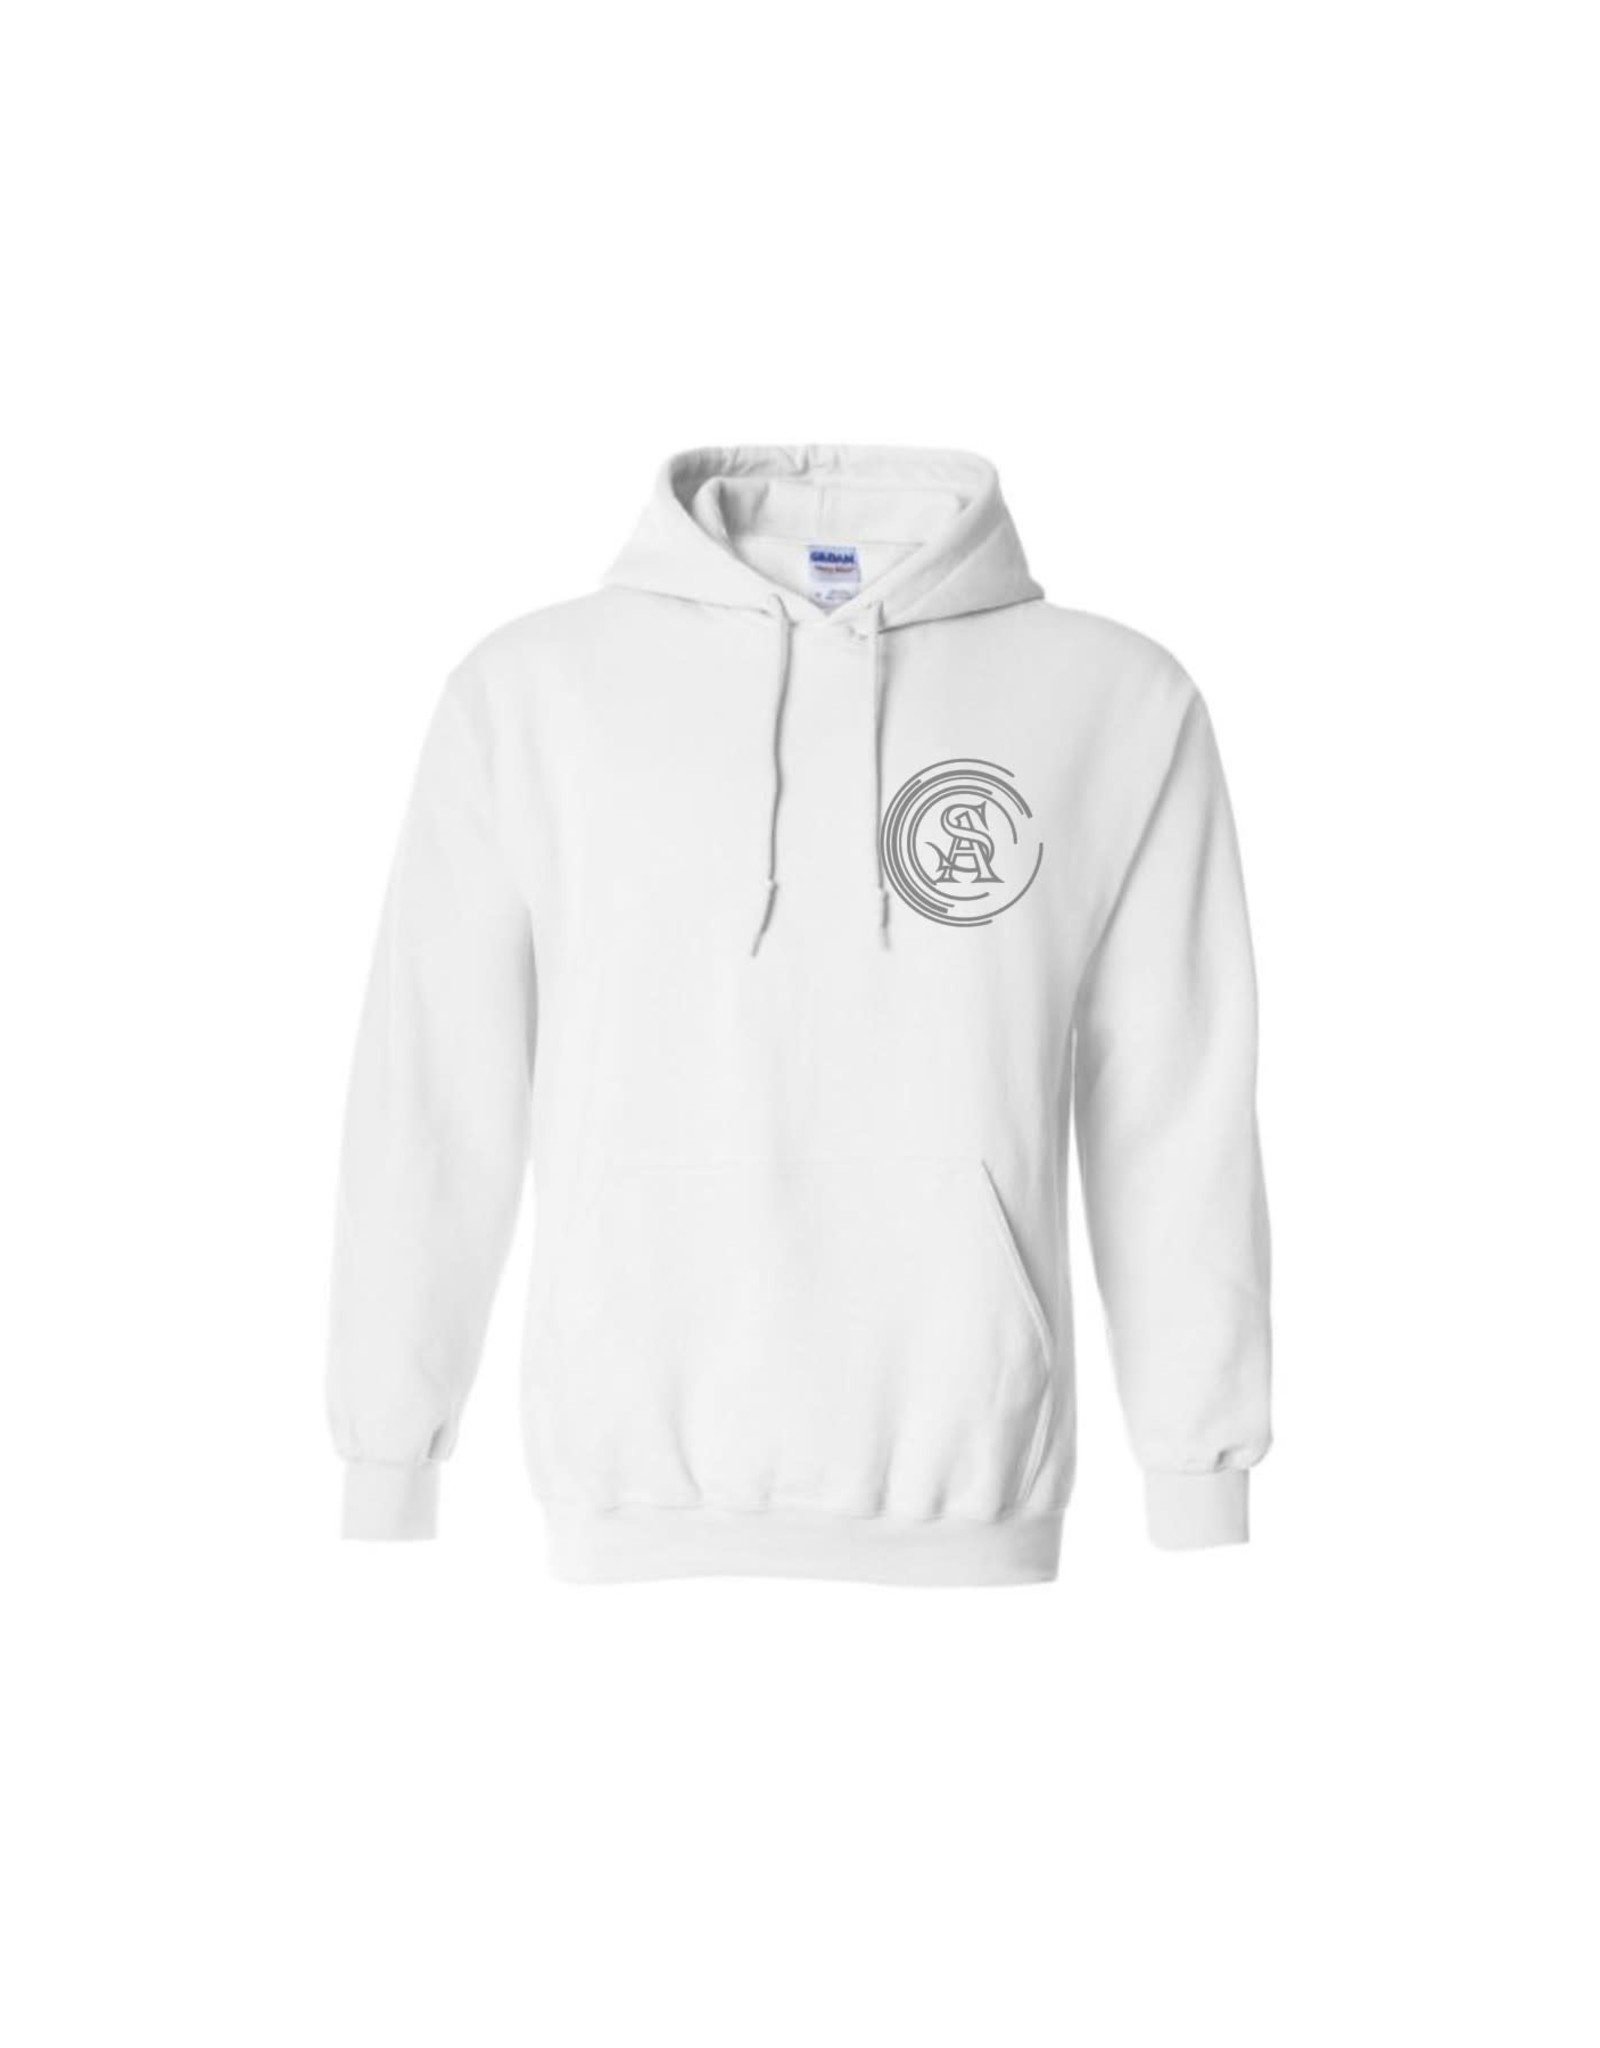 STA Hooded Sweatshirt Design (FLC)